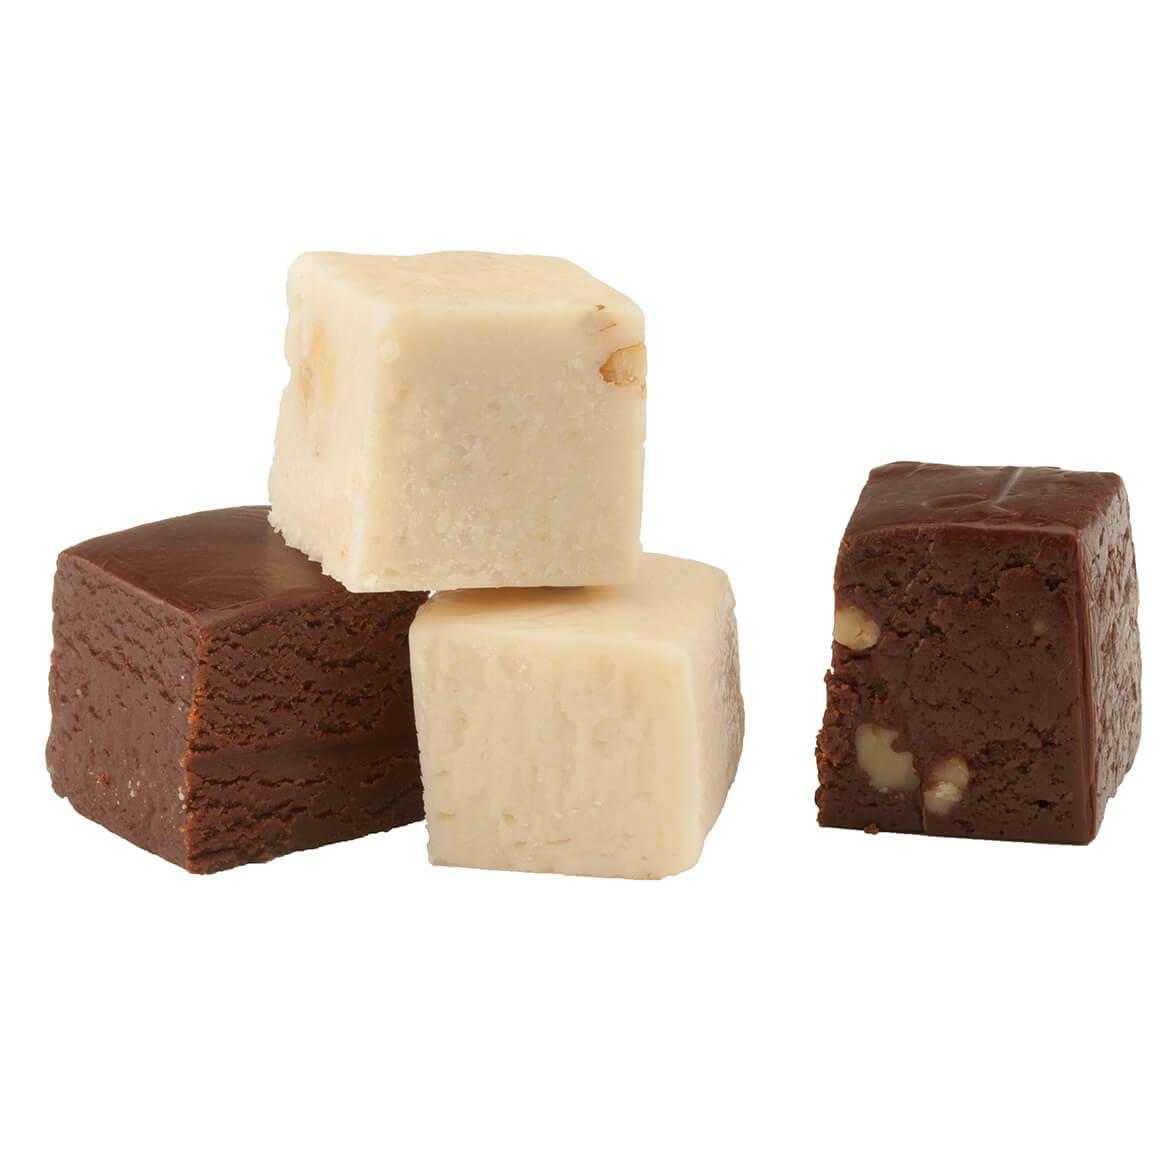 Sucrose-Free Fudge Sampler